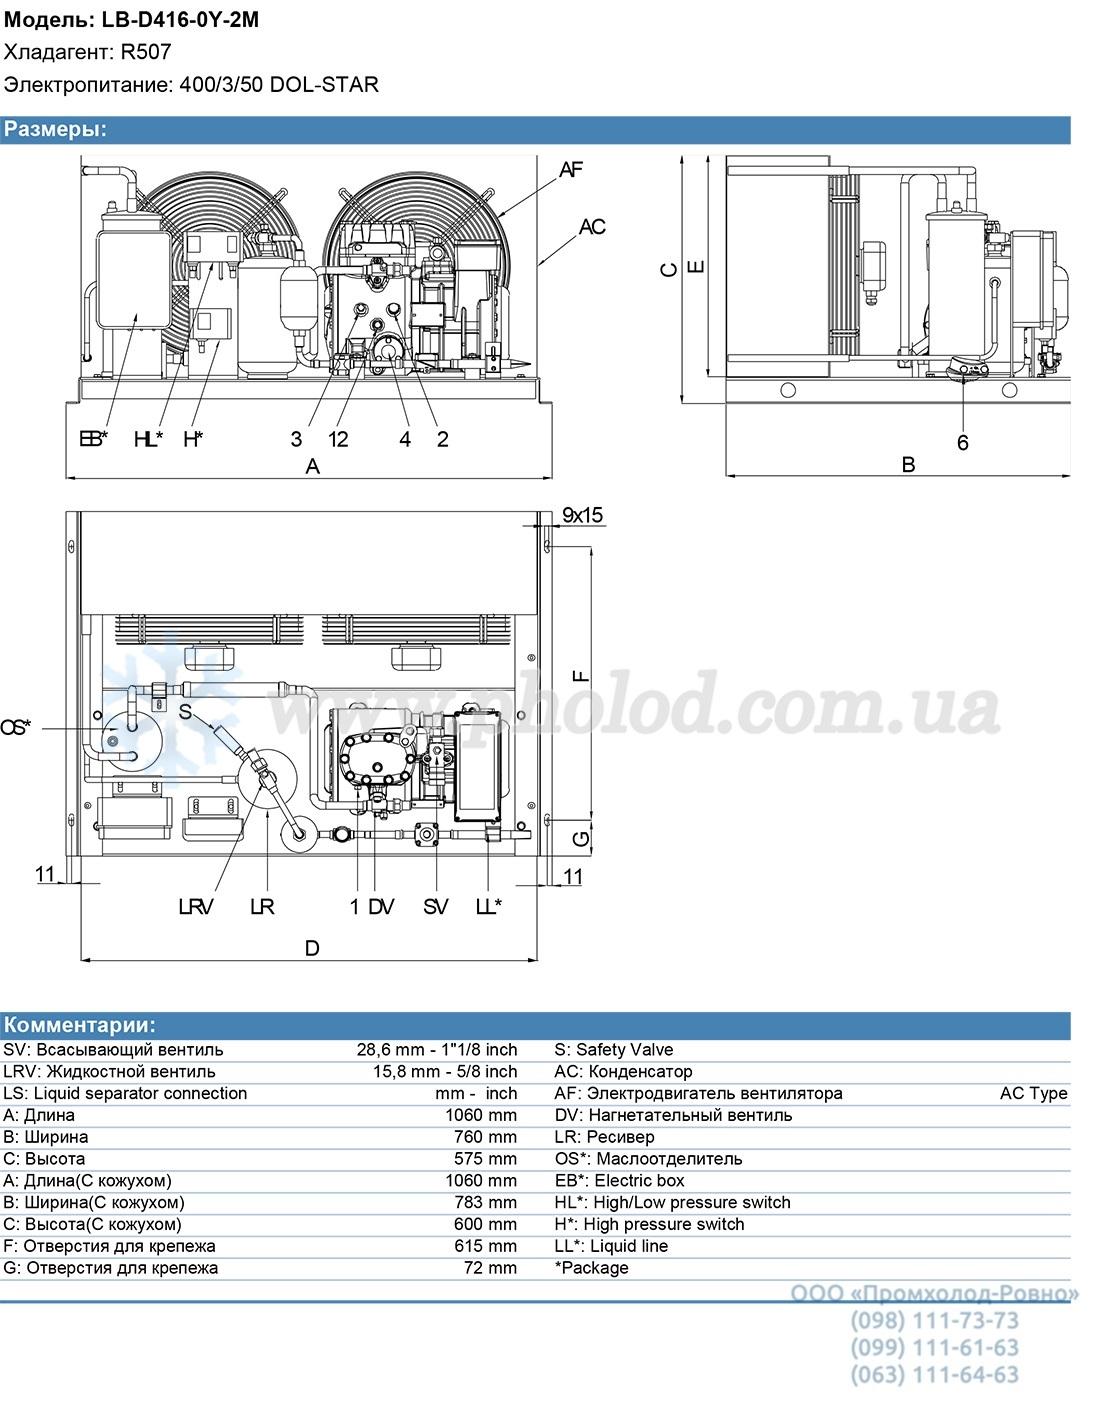 LB-D416-0Y-2M 3